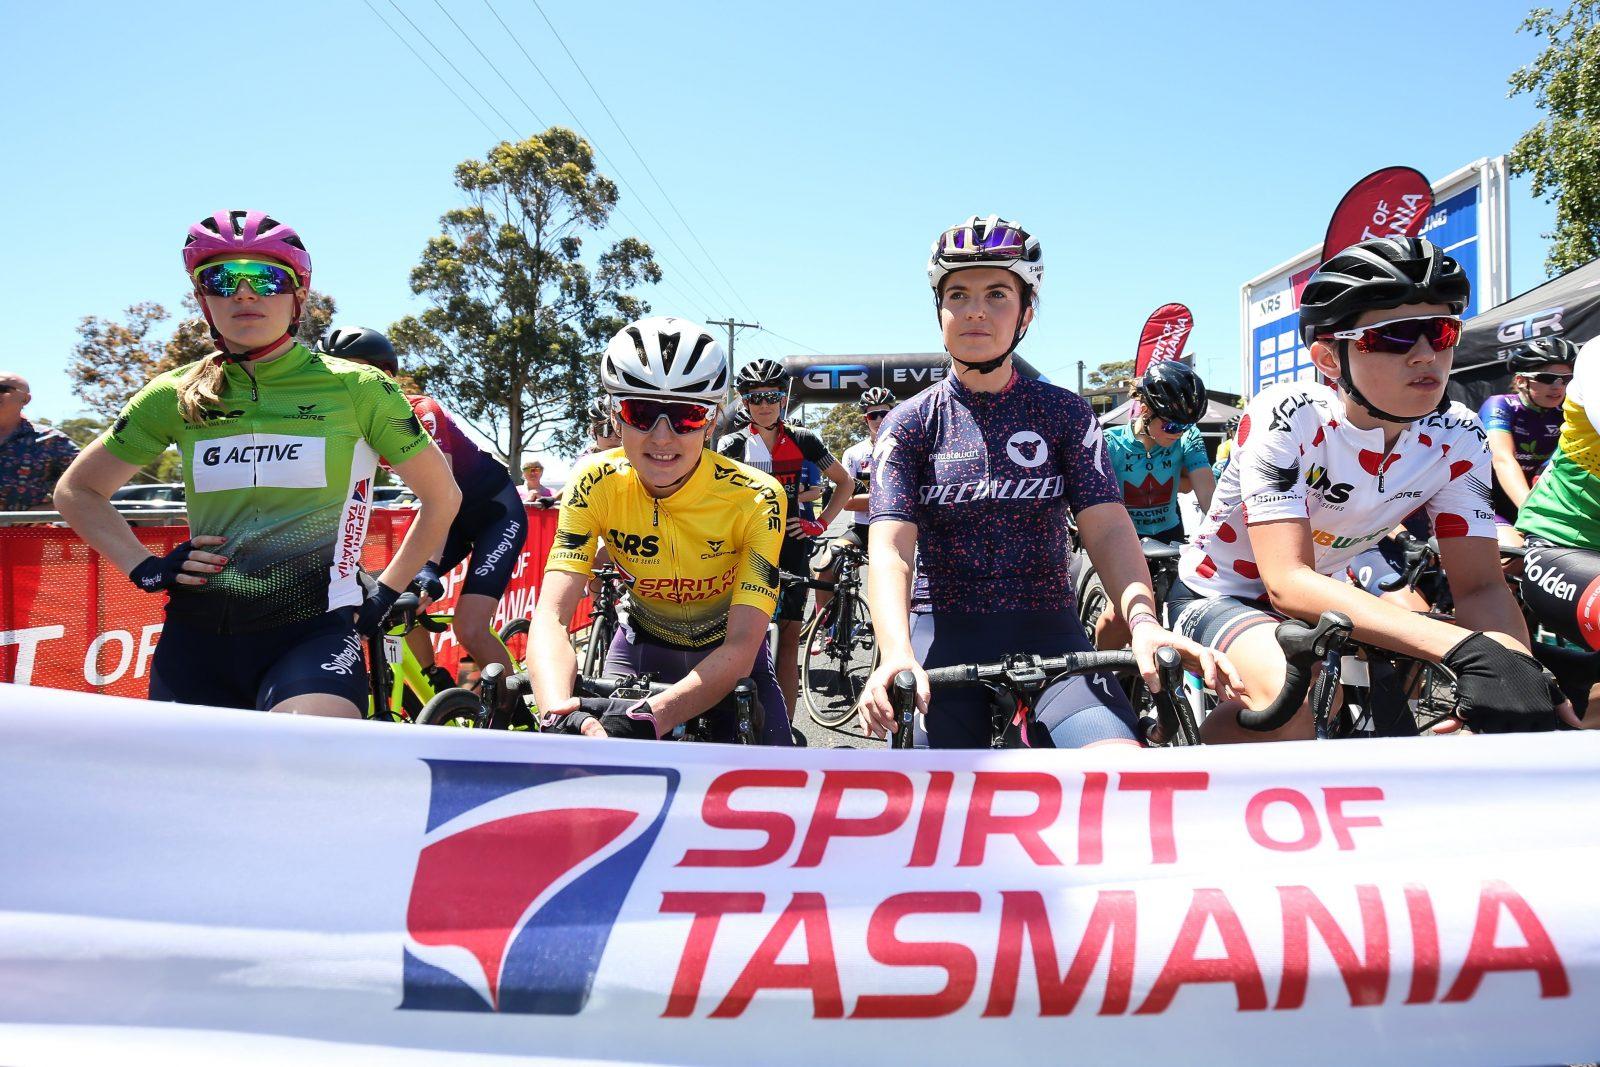 Spirit of Tasmania Cycling Tour 2018 Women's Race Ulverstone to Riana